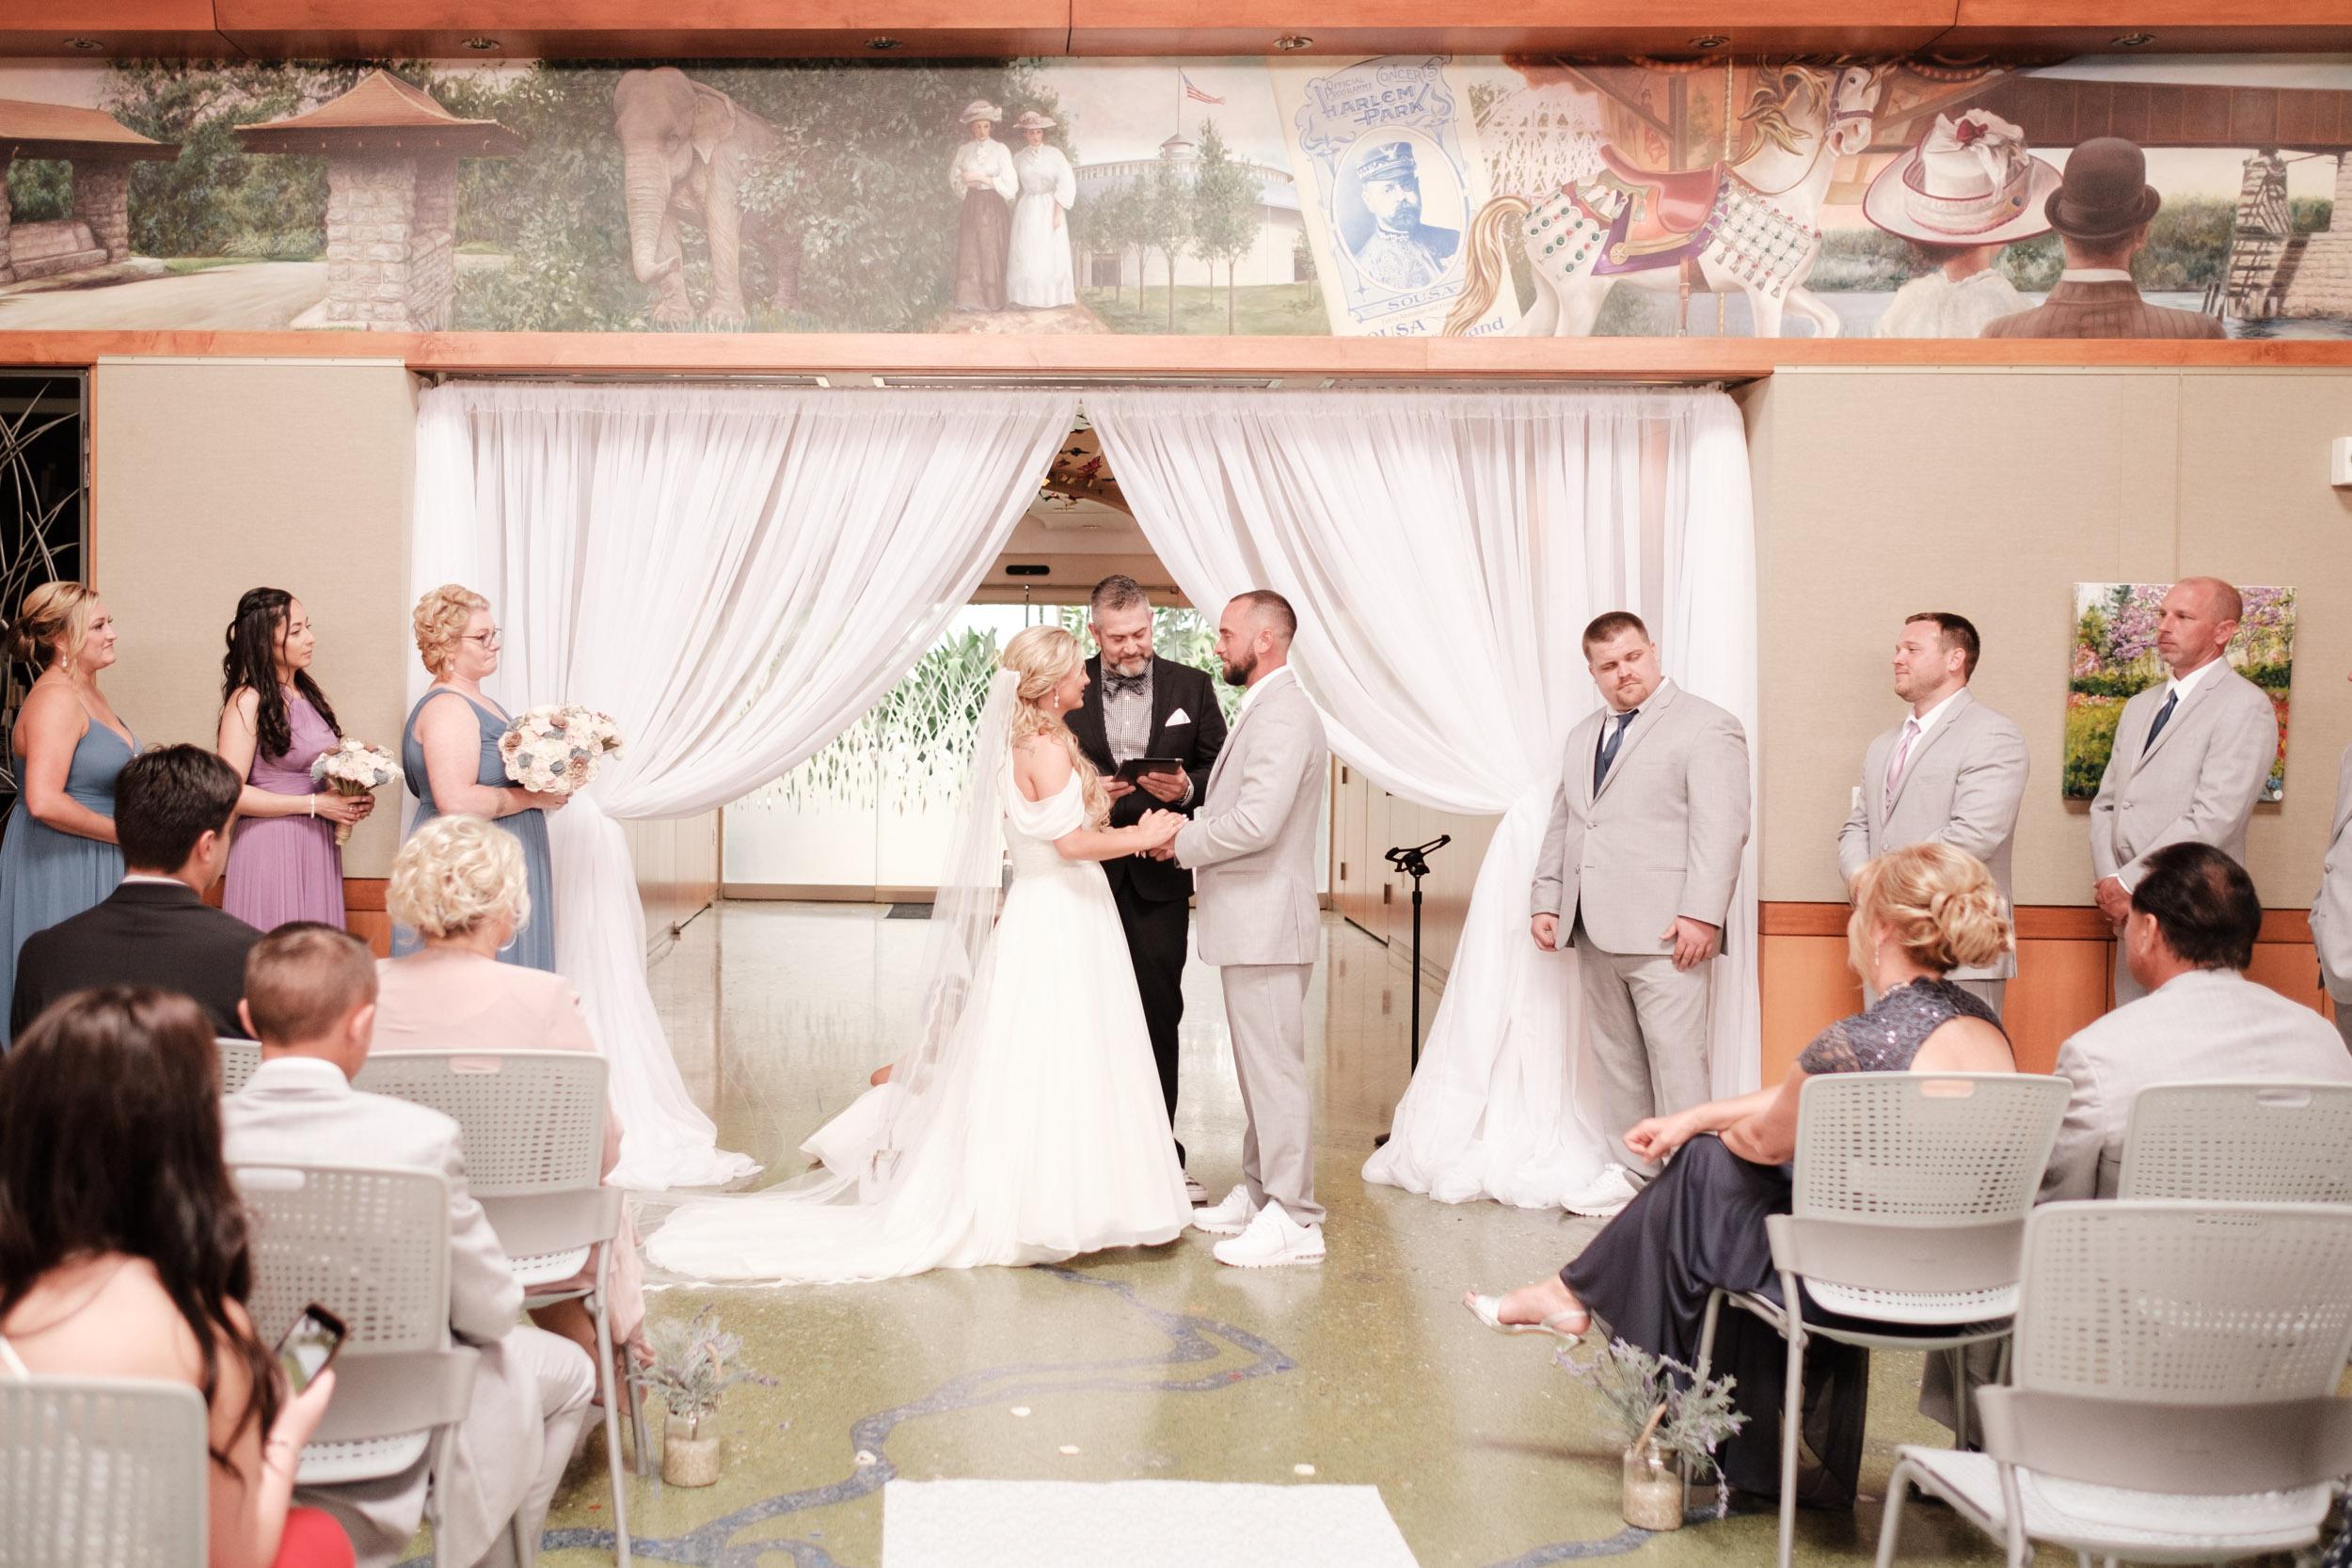 19-06-01 Megan Josh - Nicholas Conservatory Wedding-19.jpg